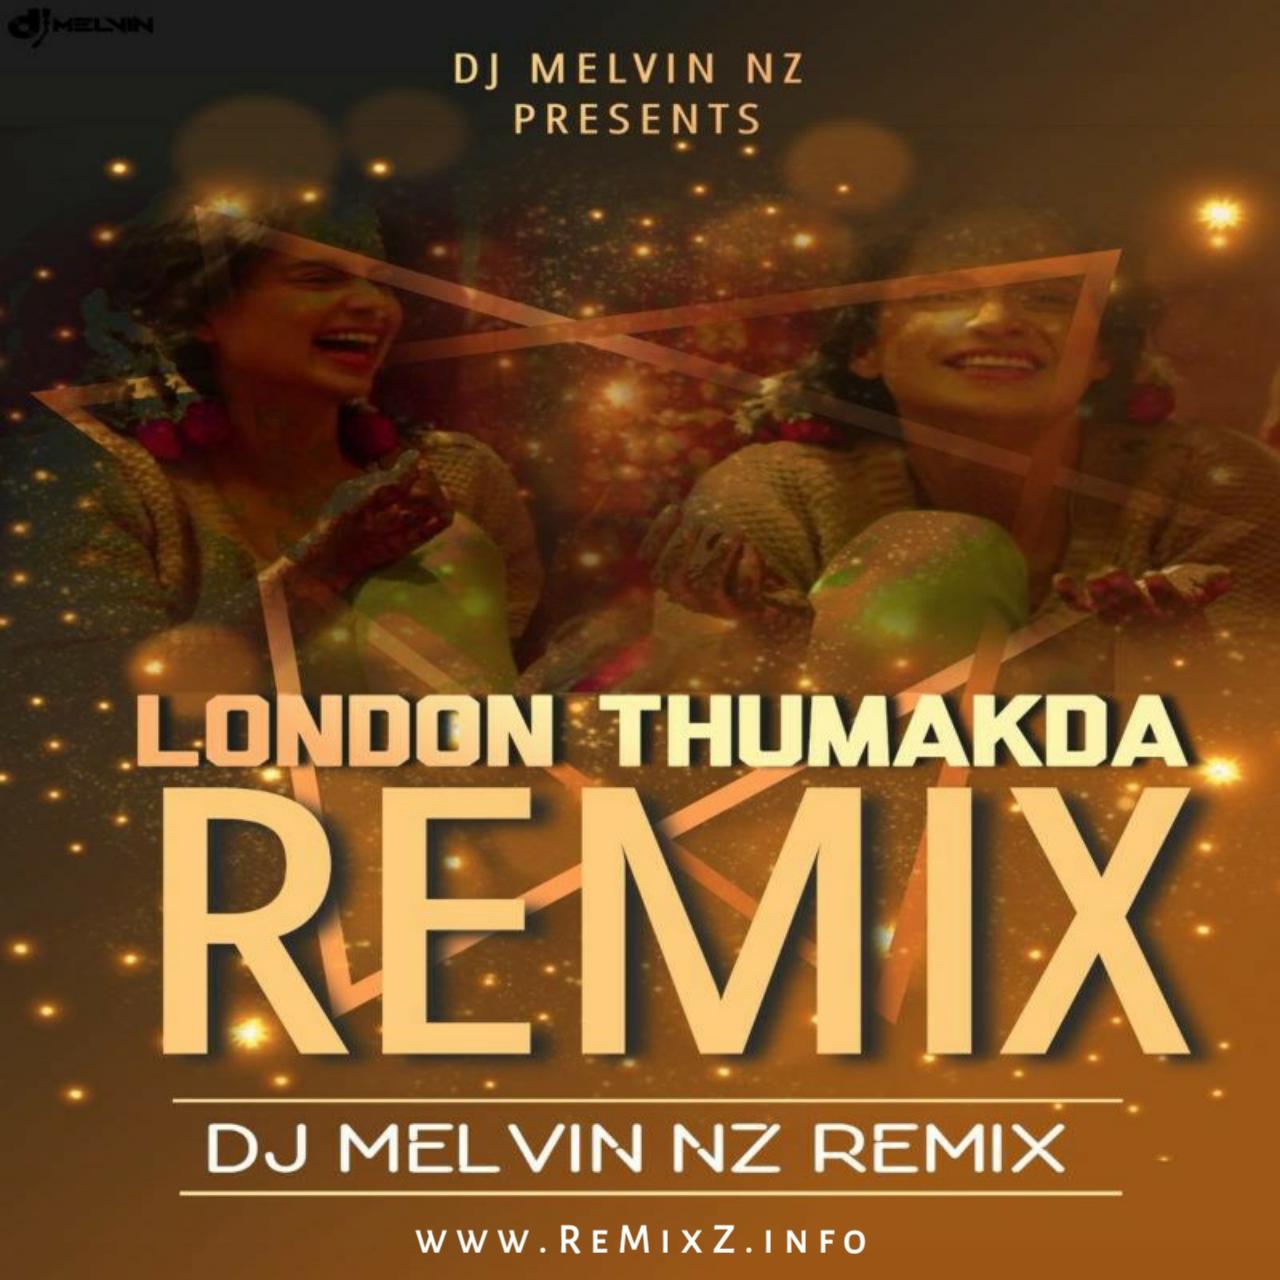 london-thumakda-remix-dj-melvin-nz.jpg